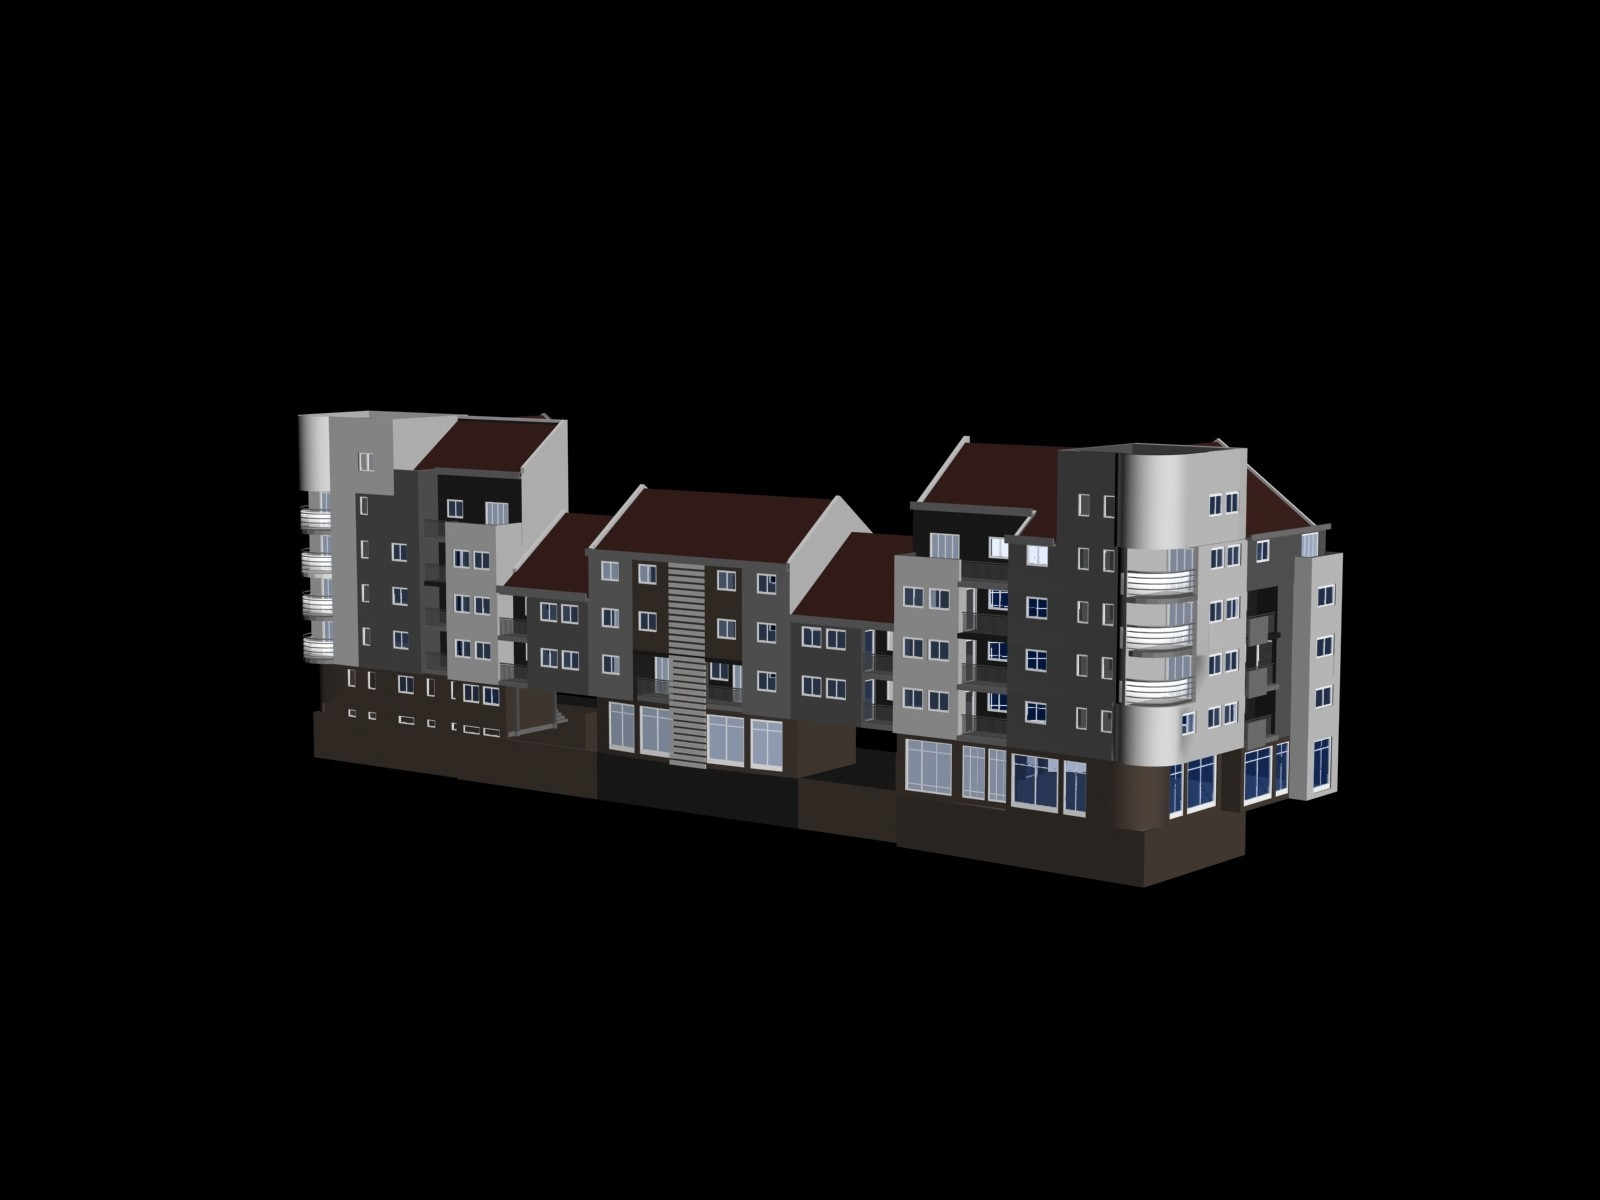 2.jpg Download free STL file Building complex • 3D printer design, Zorana